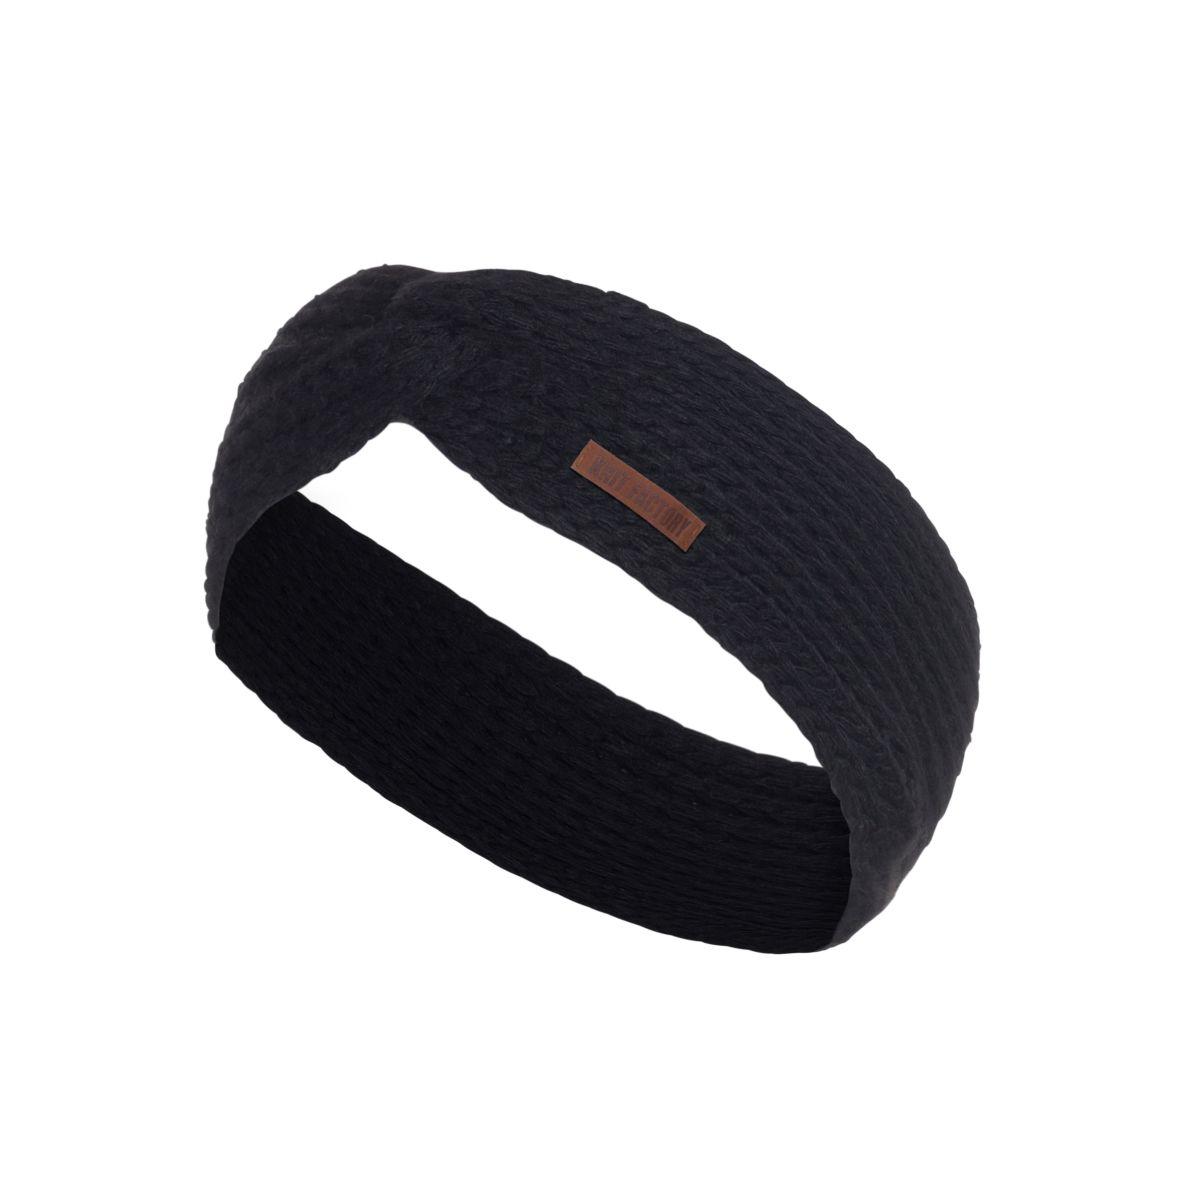 joy headband black